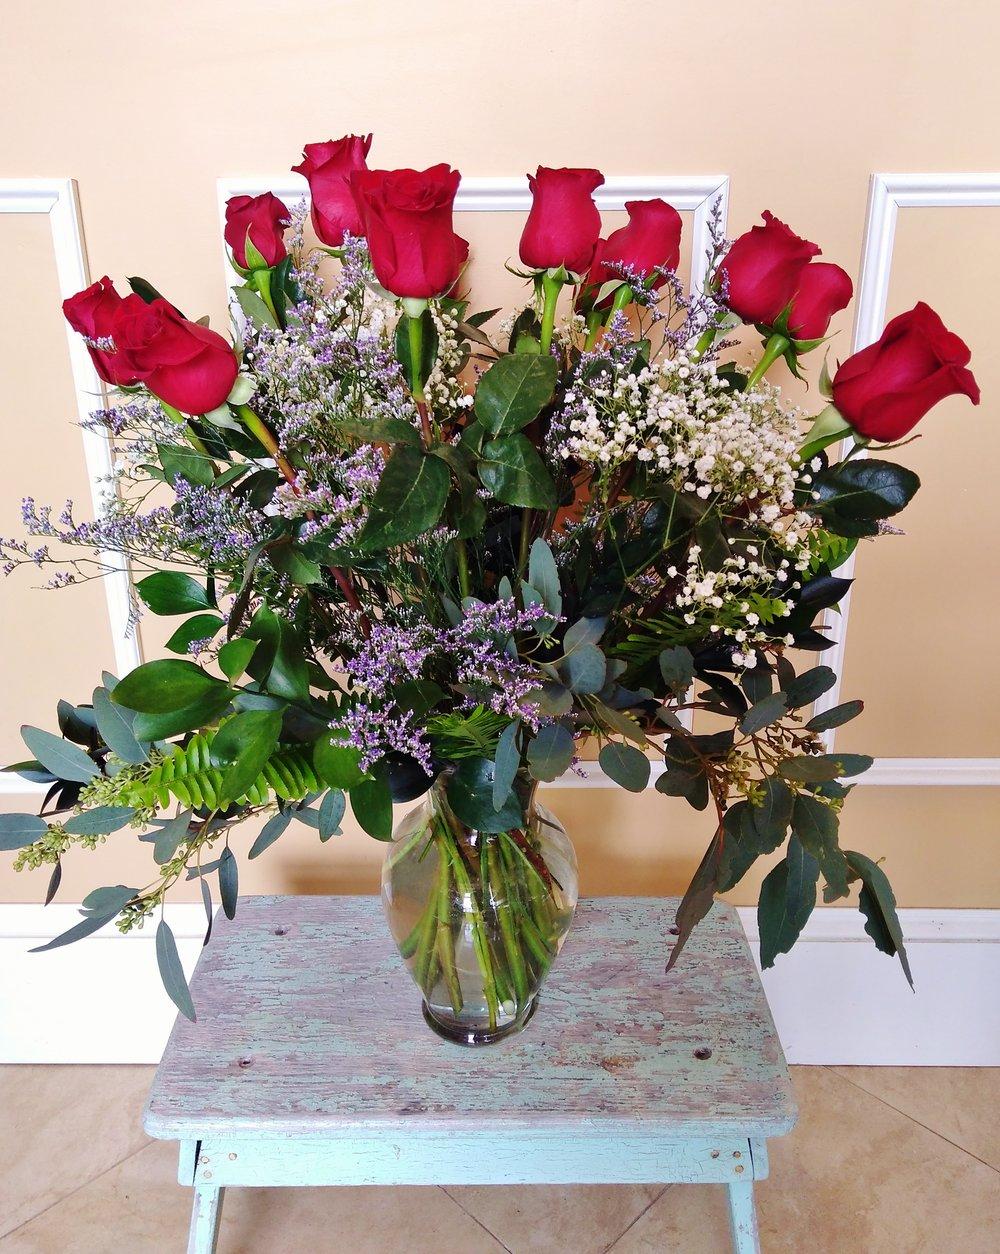 E9   $100 - $200 Tall contemporary arrangement. $125 as shown.